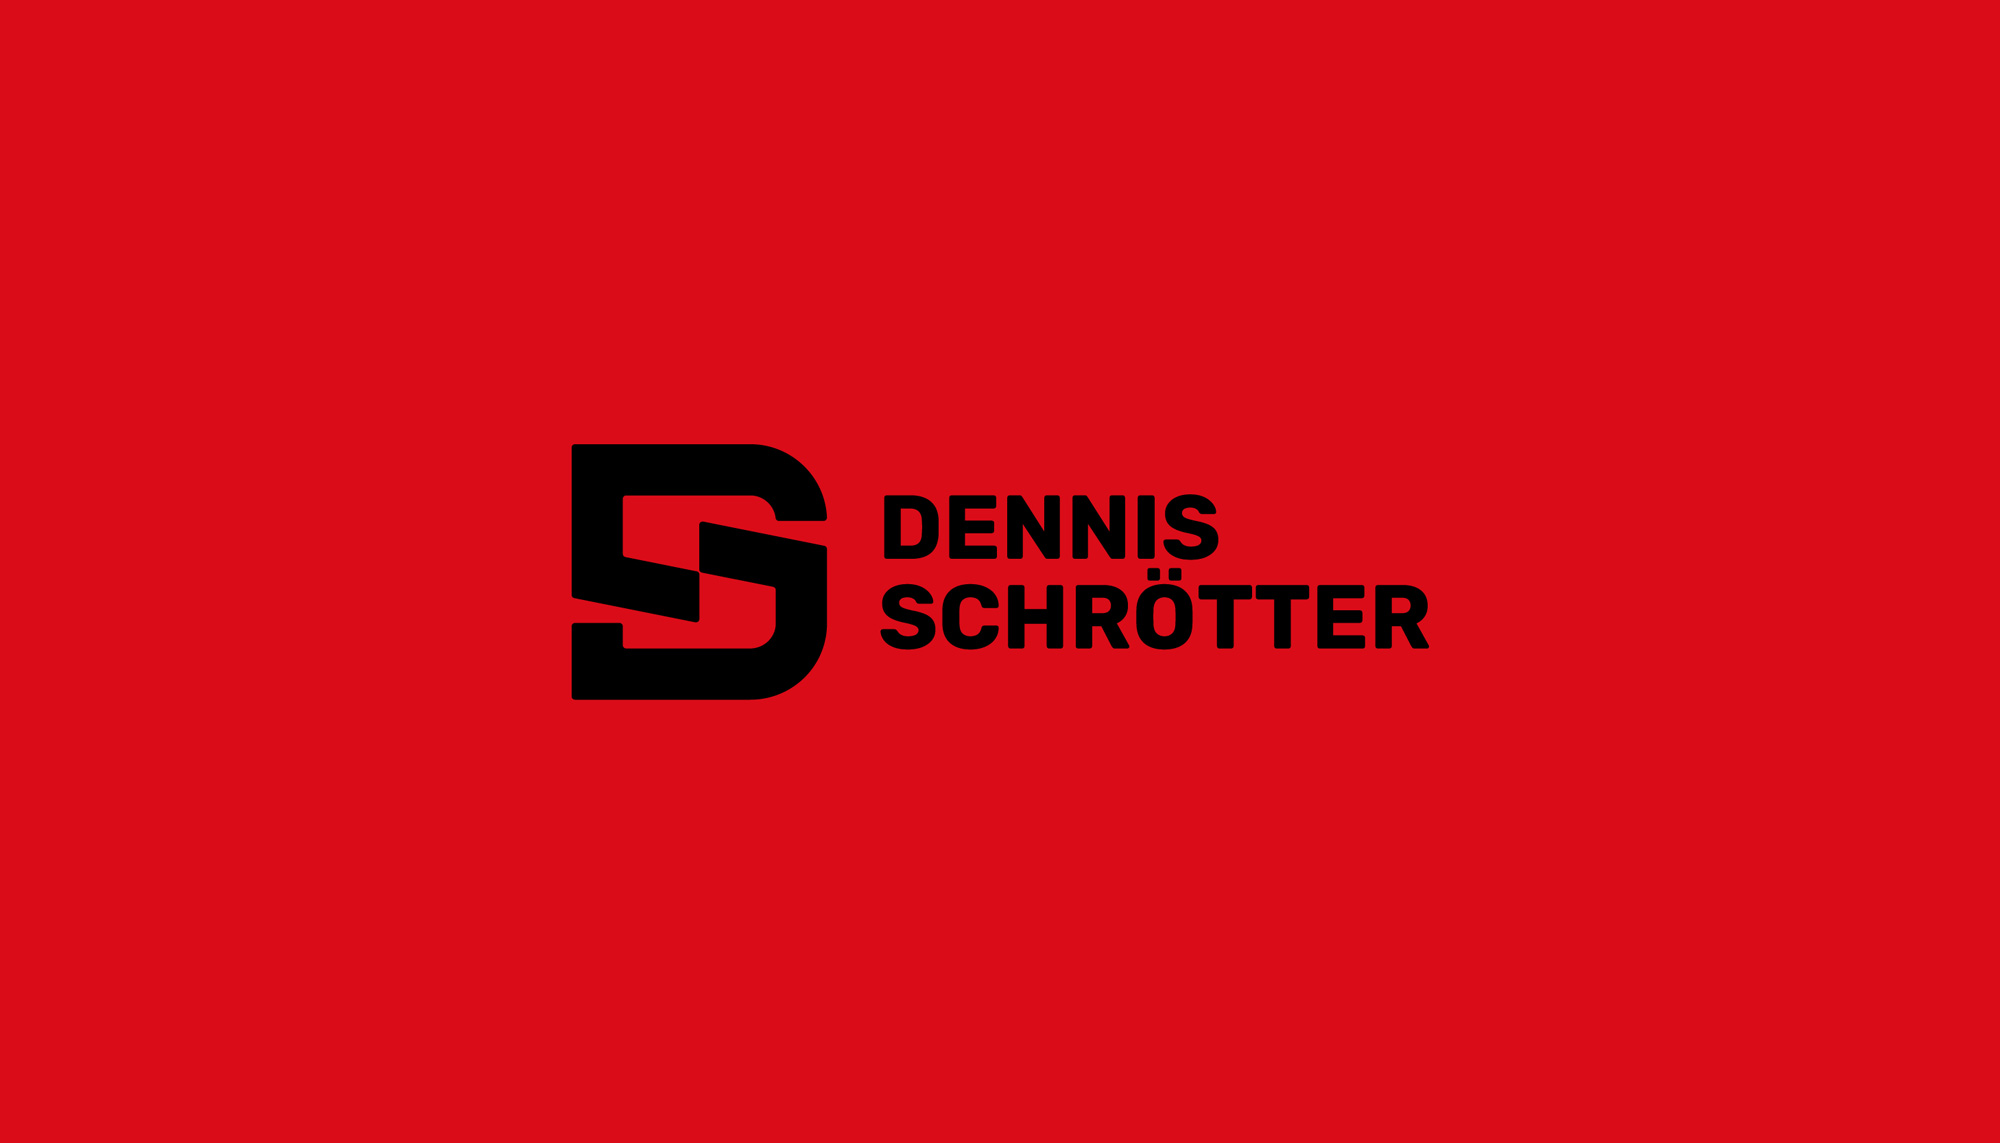 Dennis Schrötter - Personal Branding